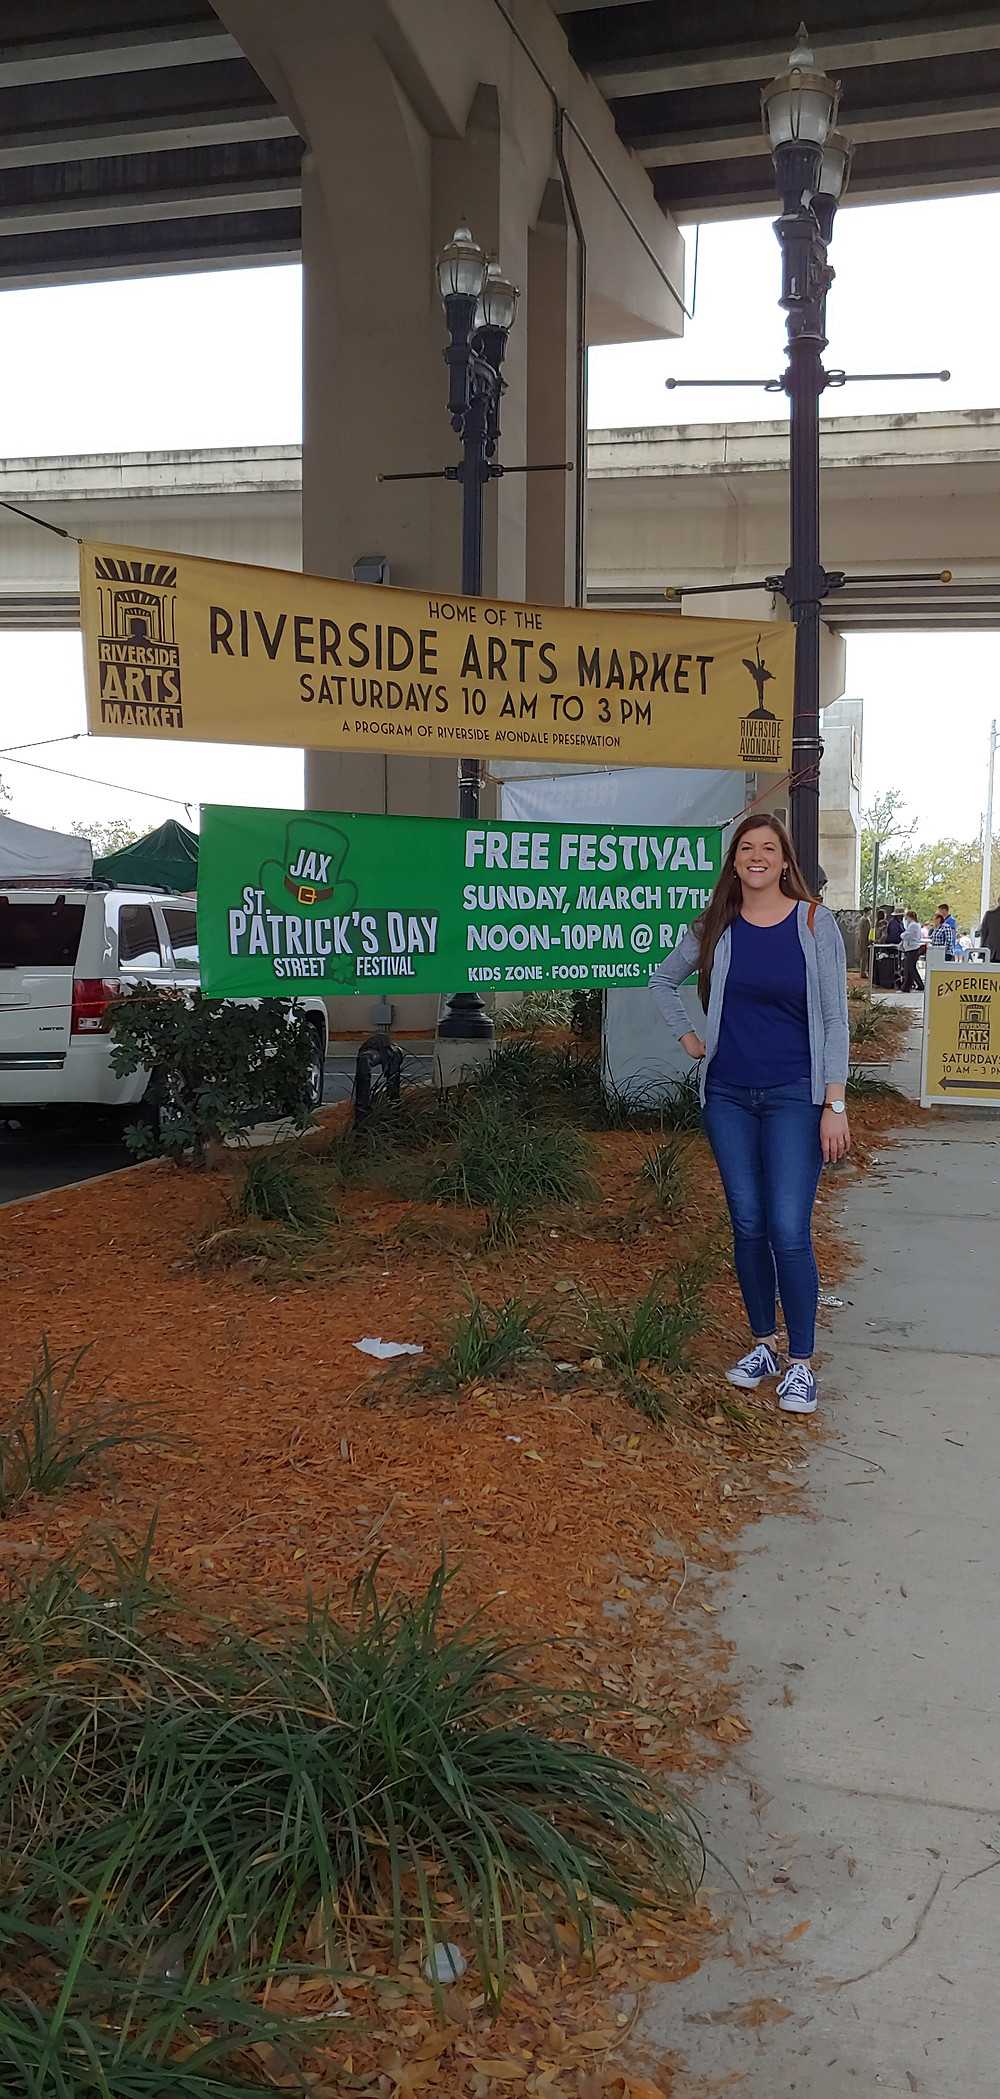 A girl standing outside the Riverside Arts Market entrance.